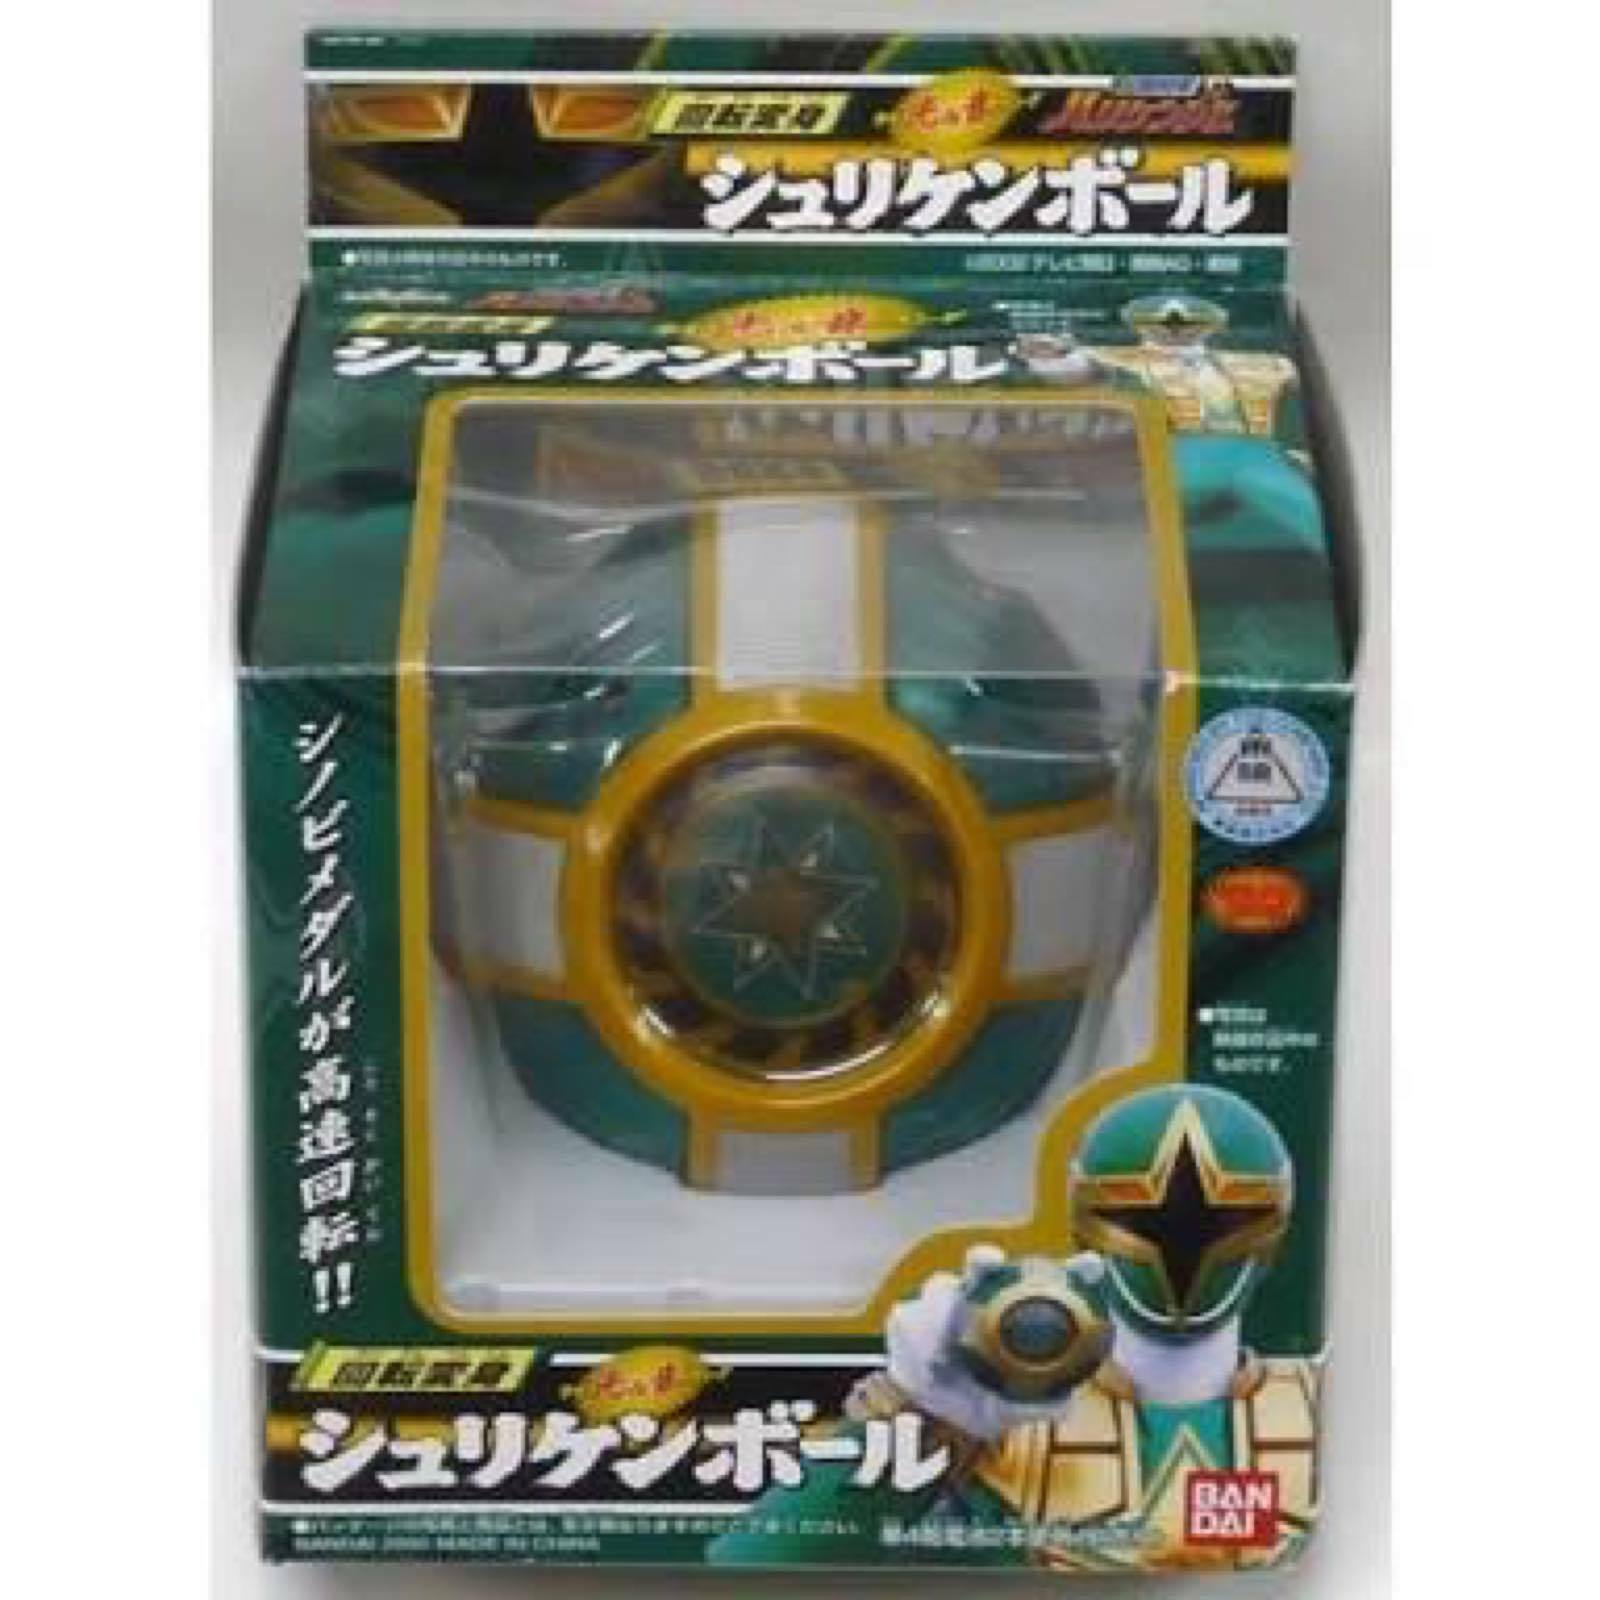 Power Rangers Ninja Storm vert samurai cyclone morpher megazord Zord nouveau f s JP